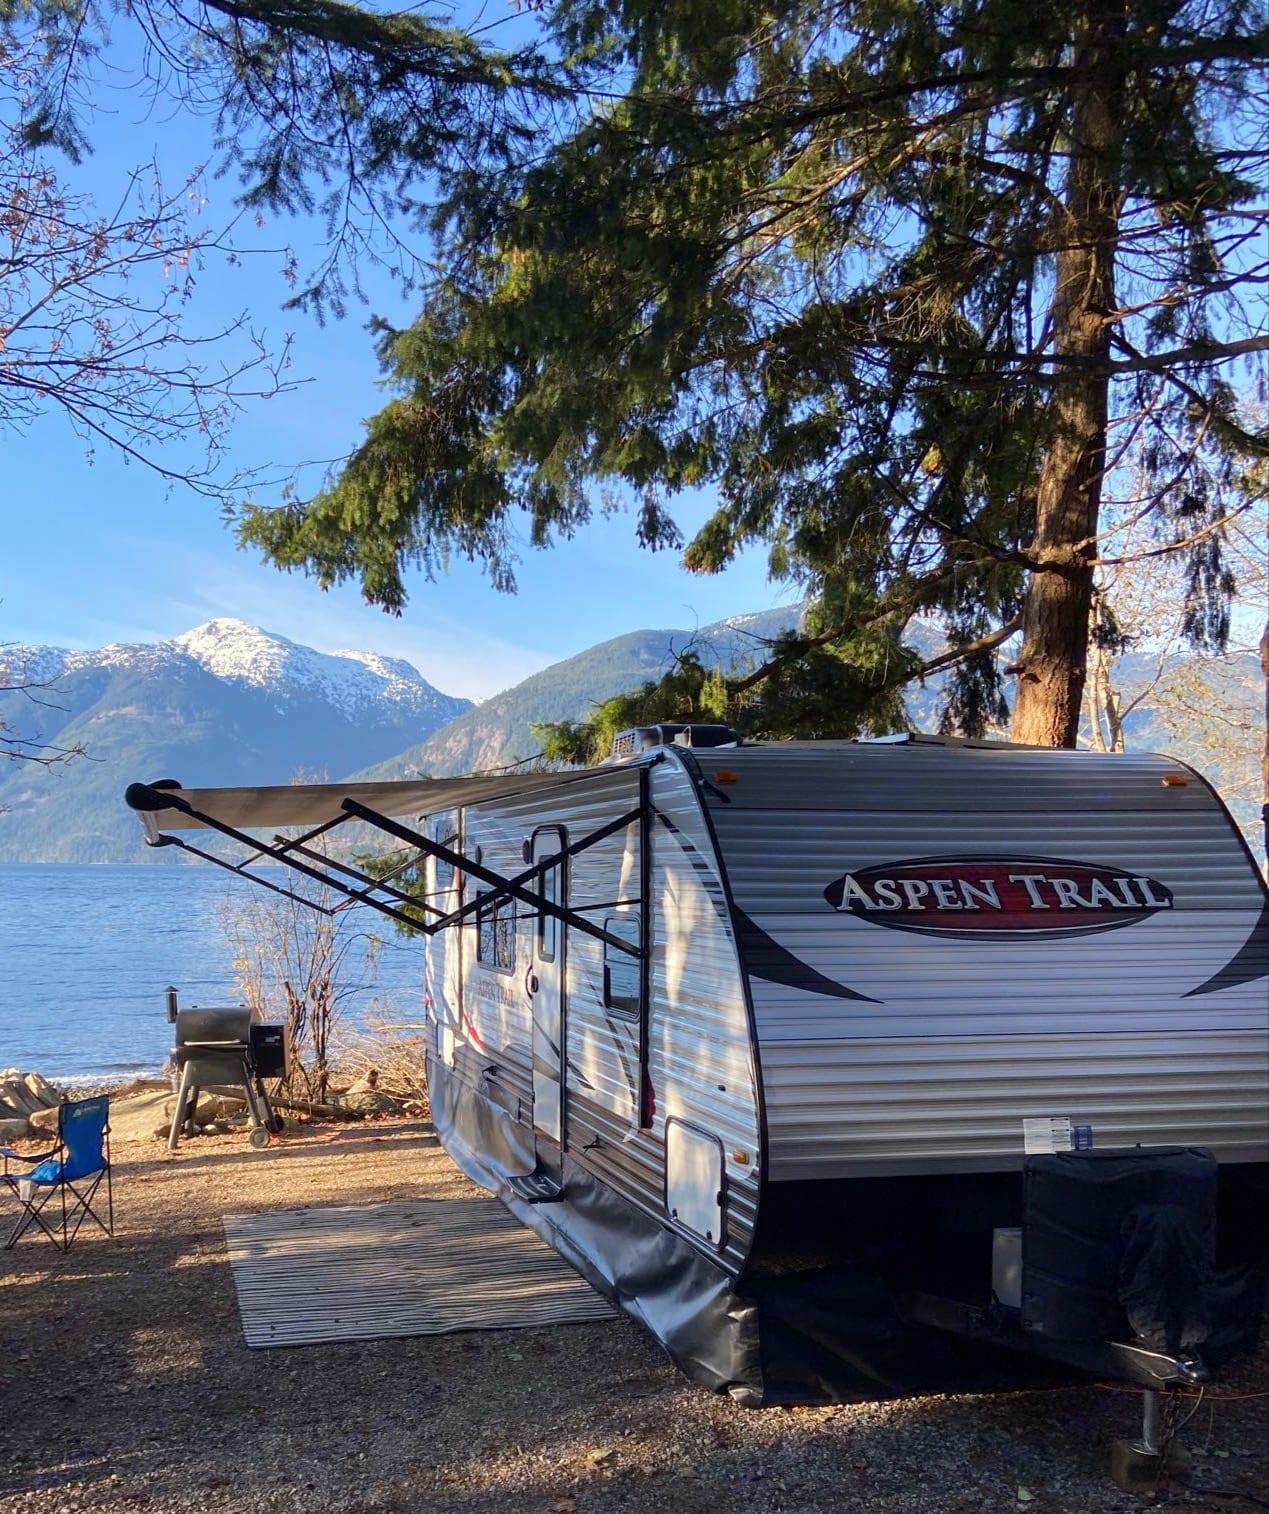 This photo was taken at the poretau cove camp site near Squamish BC. Dutchmen Aspen Trail 2015